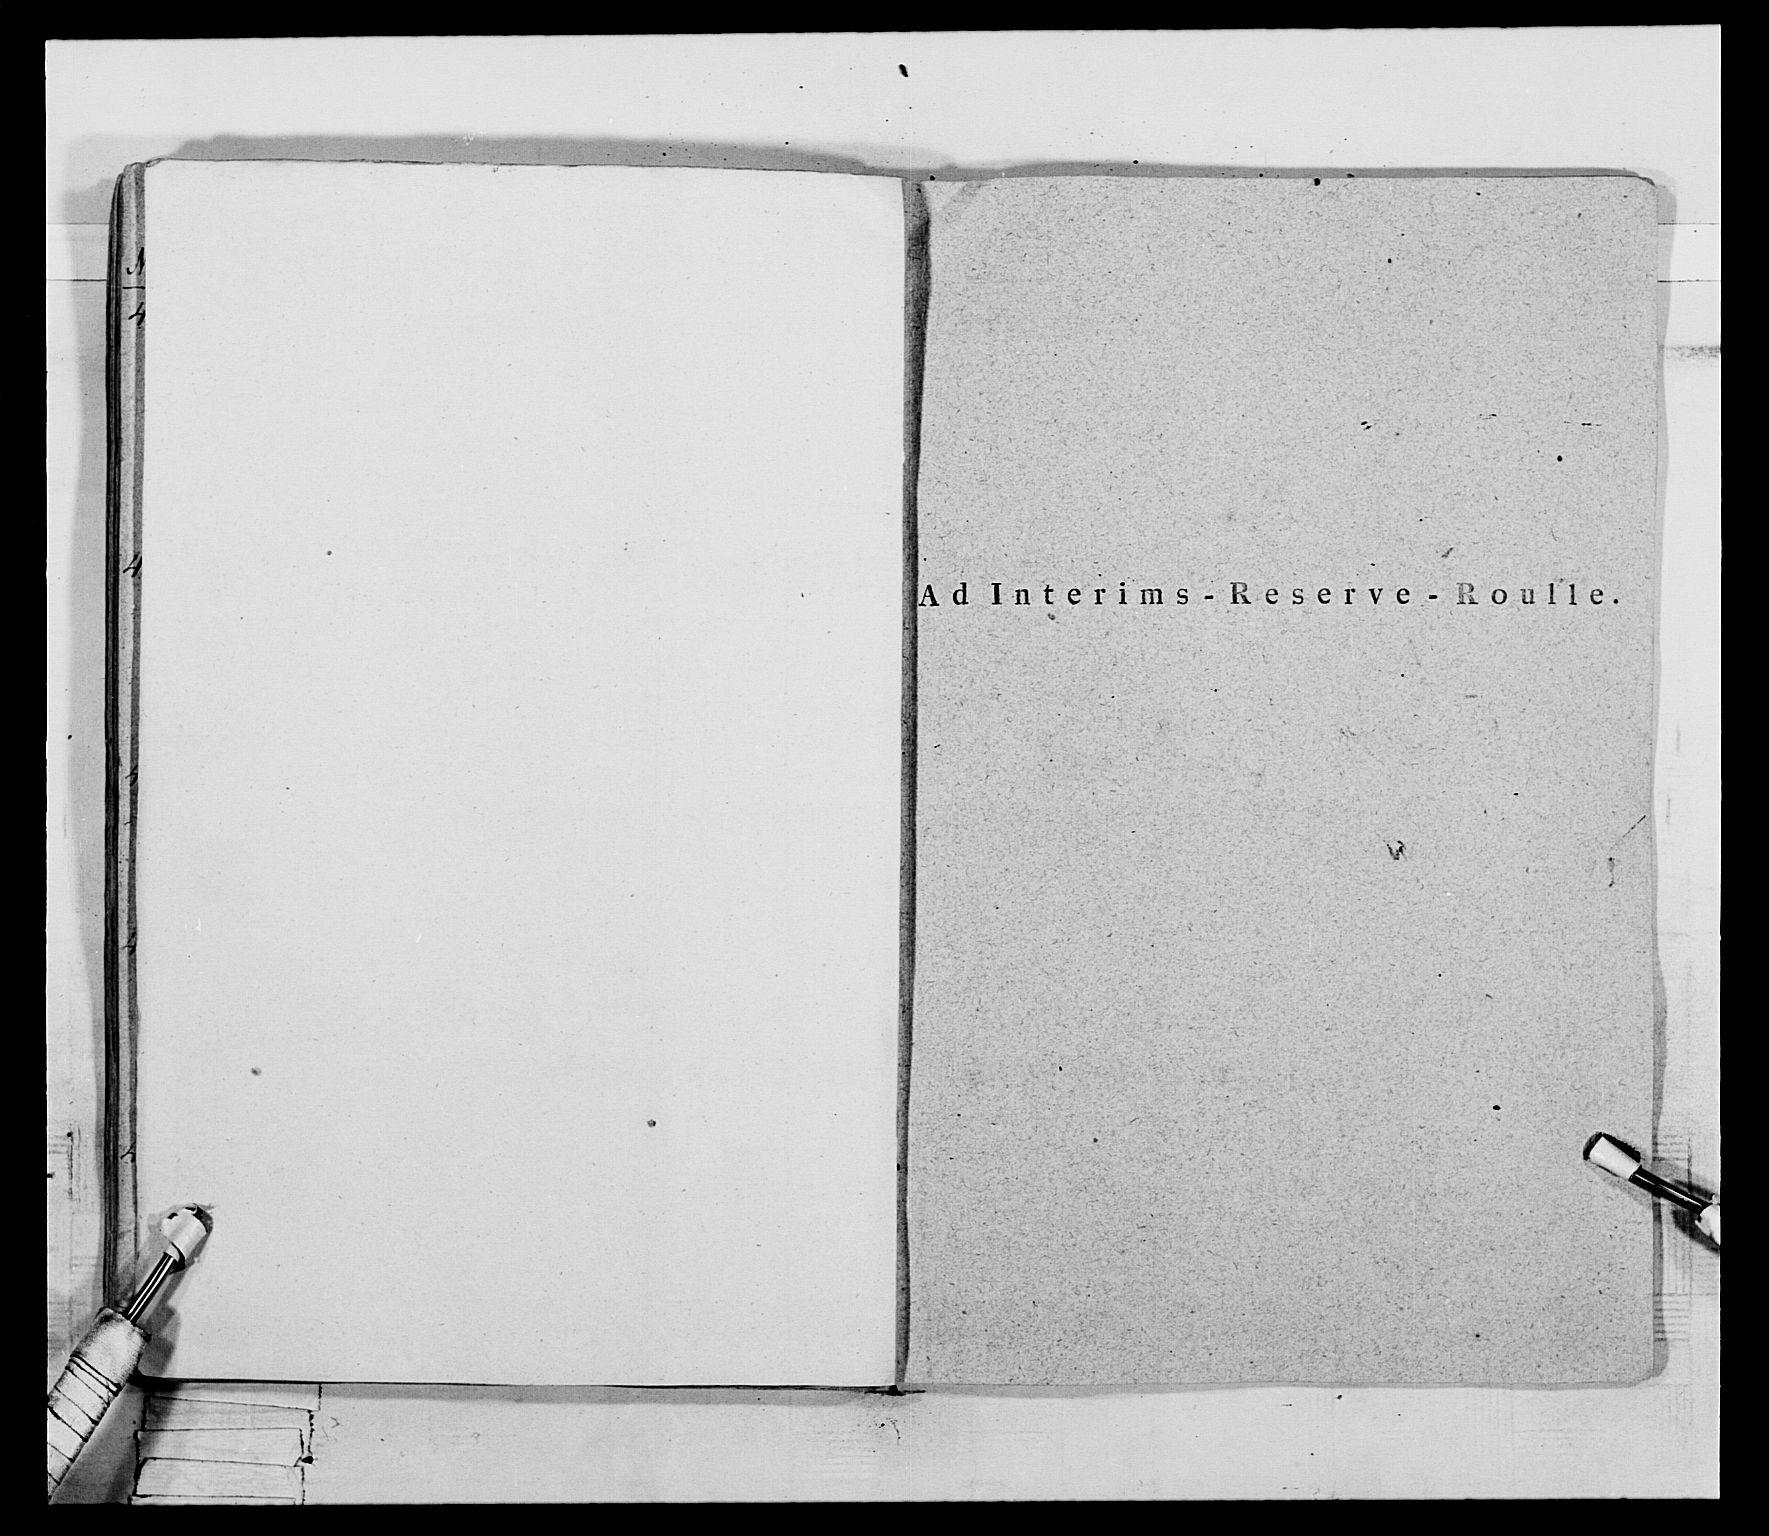 RA, Generalitets- og kommissariatskollegiet, Det kongelige norske kommissariatskollegium, E/Eh/L0069: Opplandske gevorbne infanteriregiment, 1810-1818, s. 47